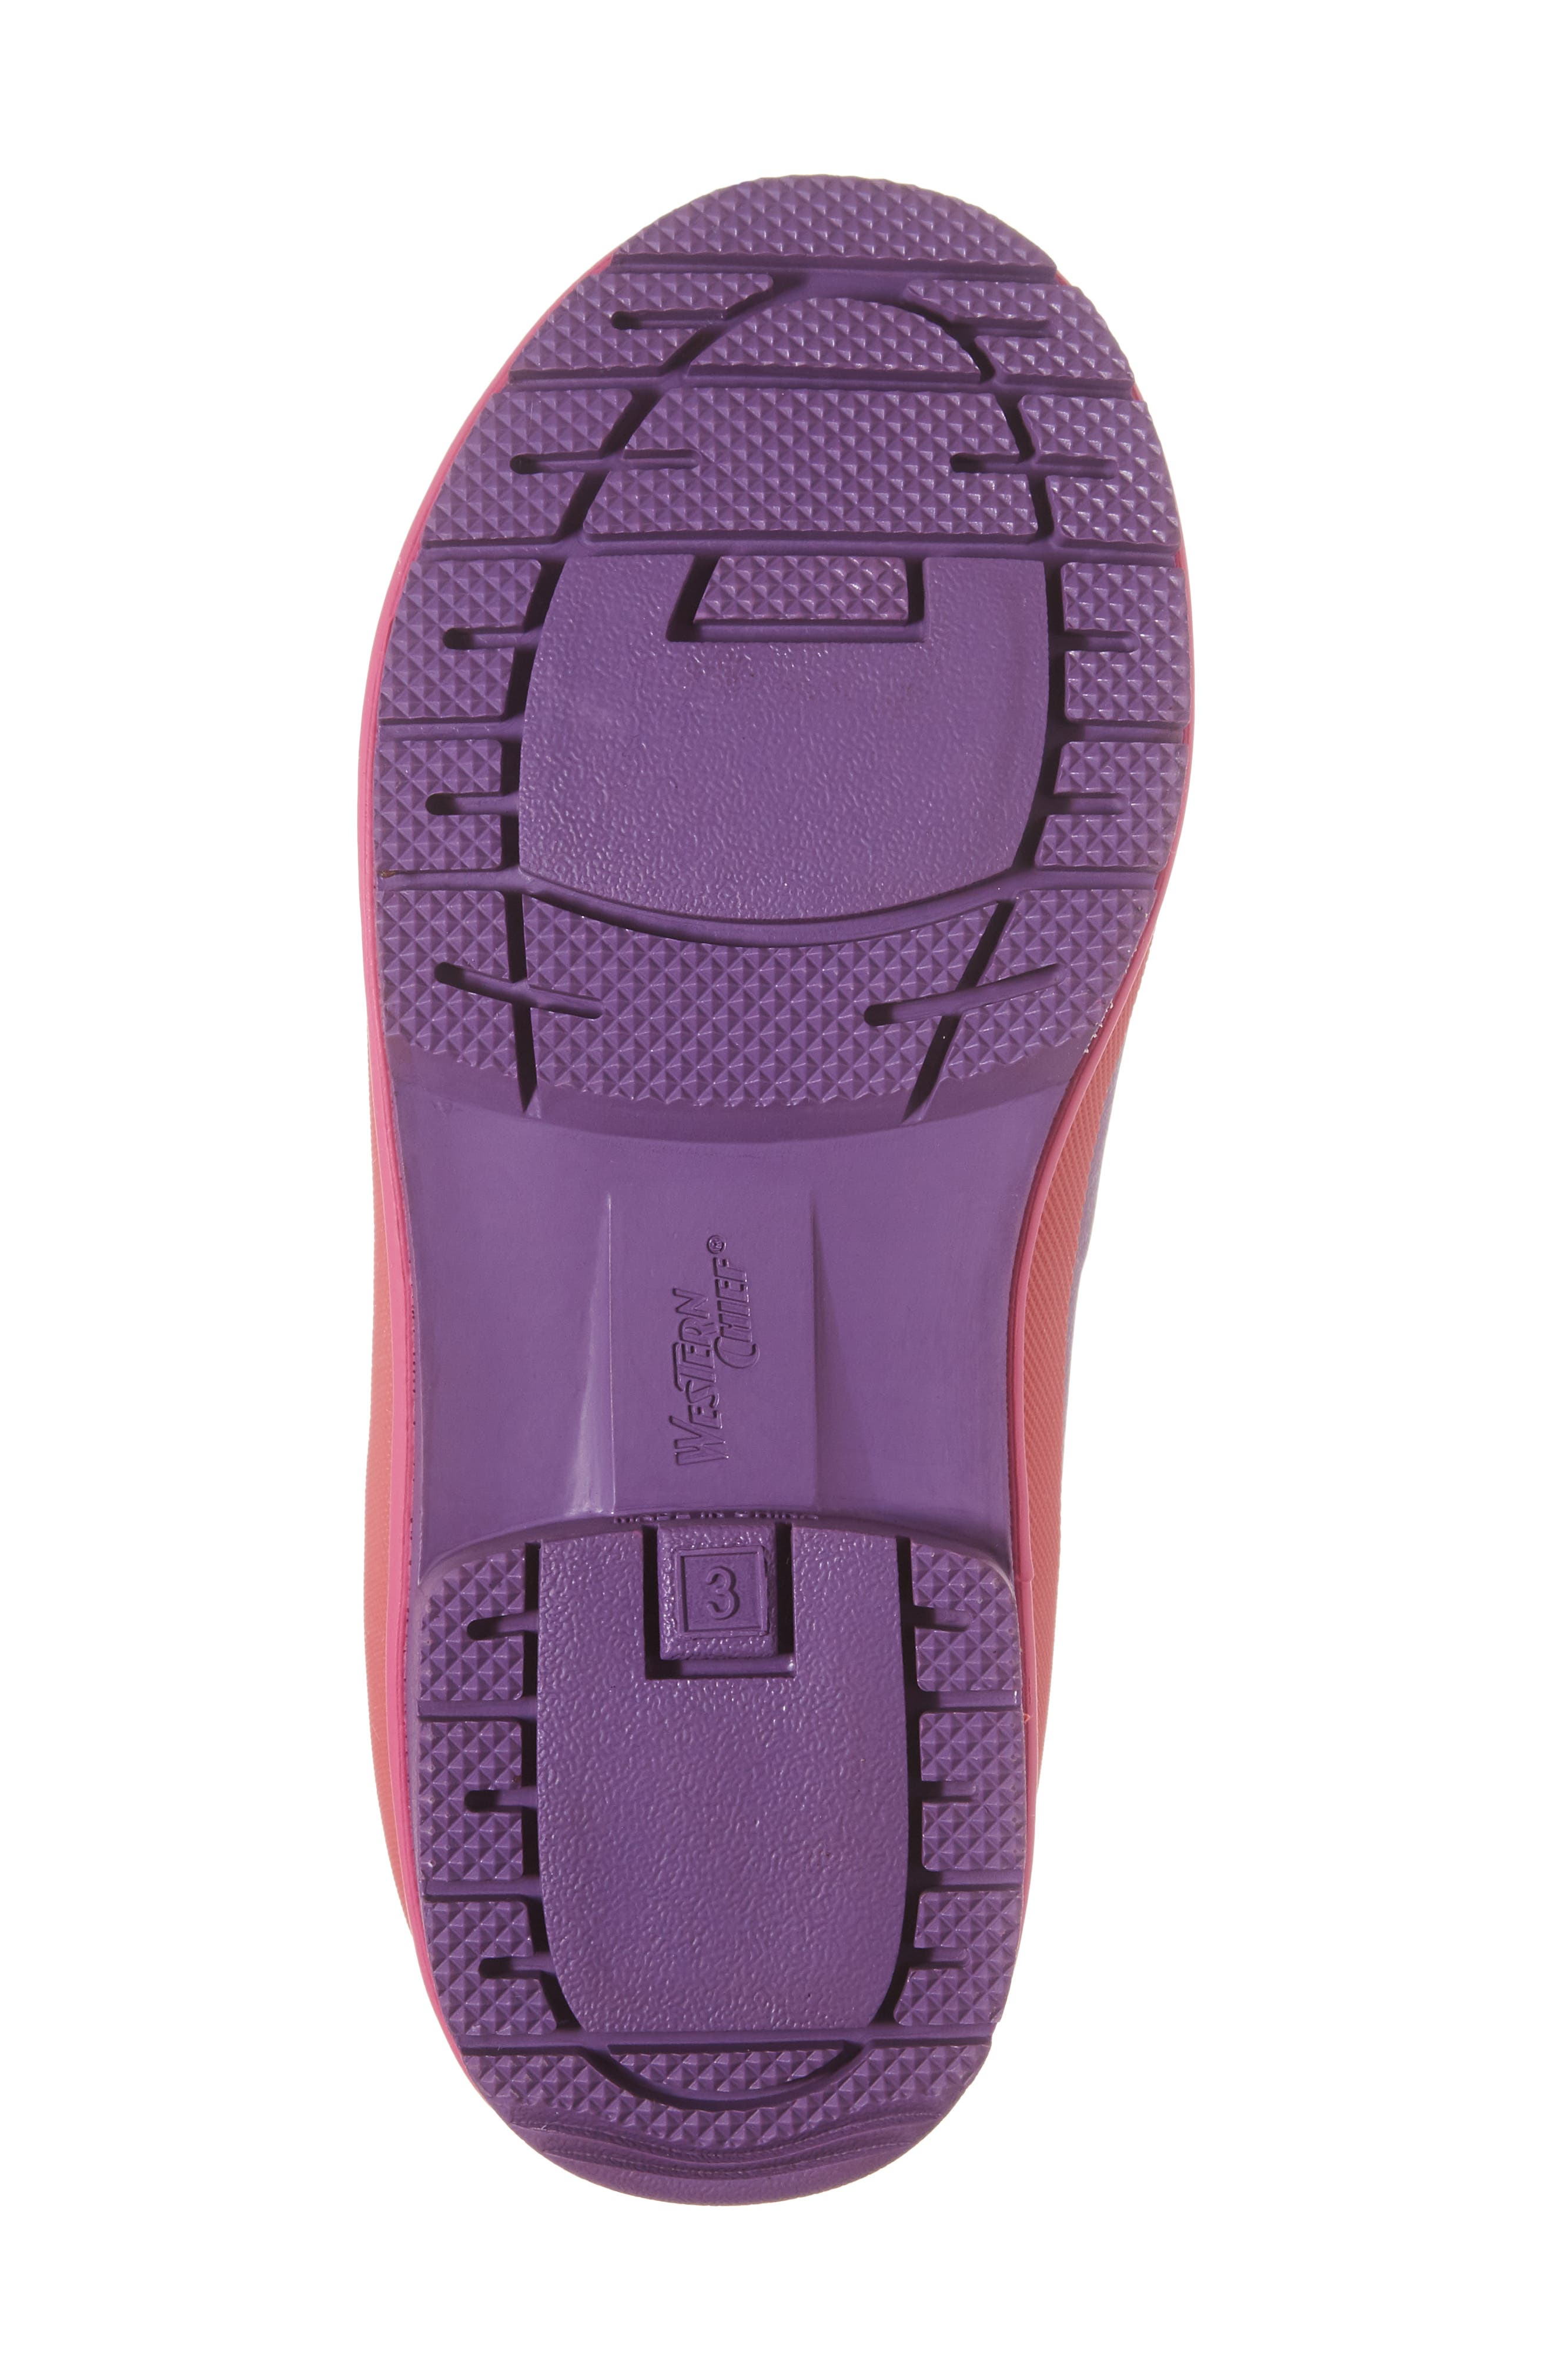 Neoprene Purple Snow Boot,                             Alternate thumbnail 6, color,                             Purple